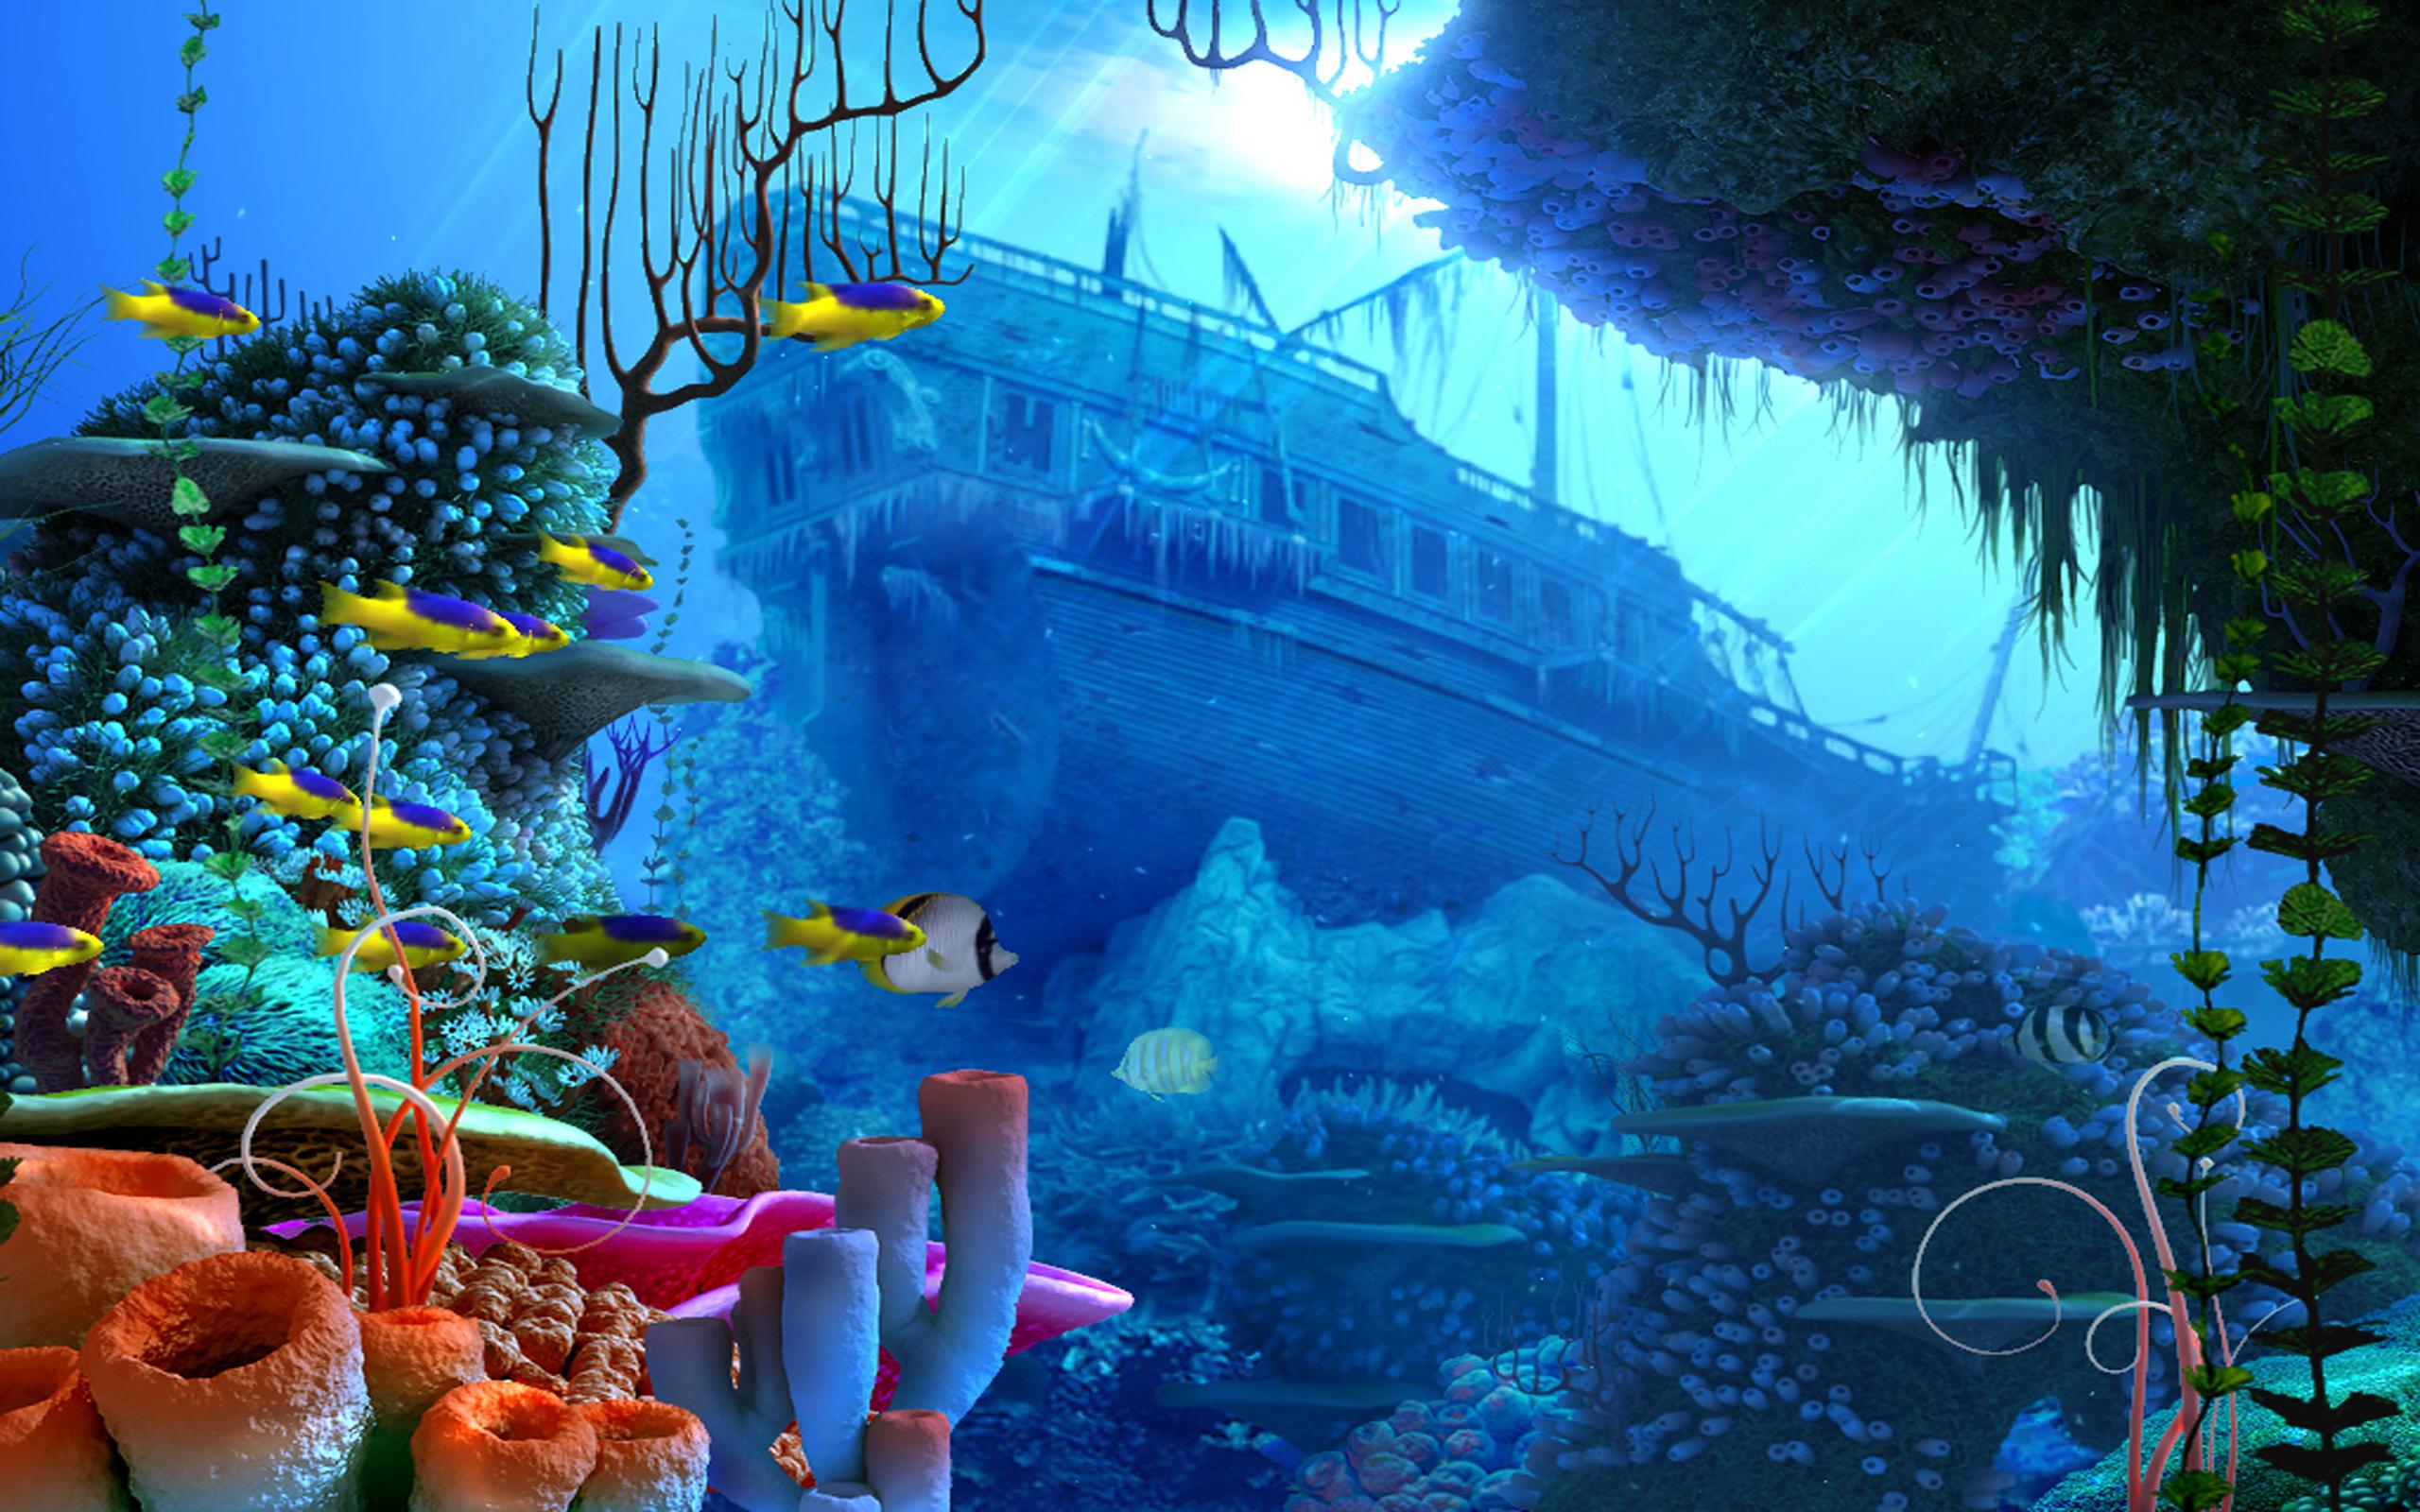 Hd wallpaper underwater - Hd Wallpaper Background Id 421130